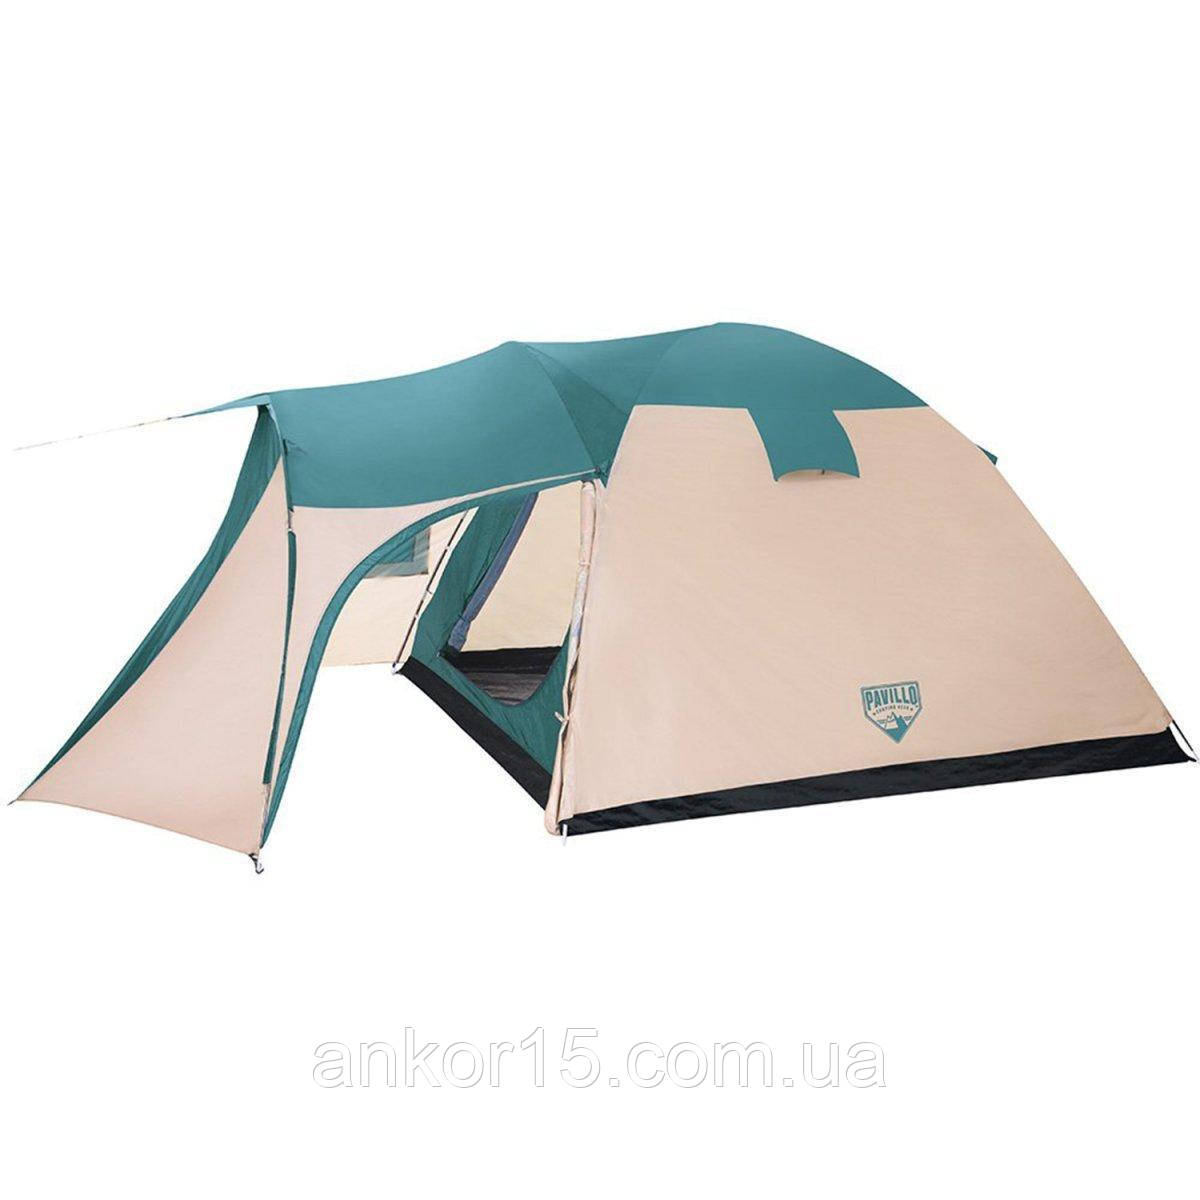 Пятиместная палатка Bestway 68015, 505 х 305 х 200 см